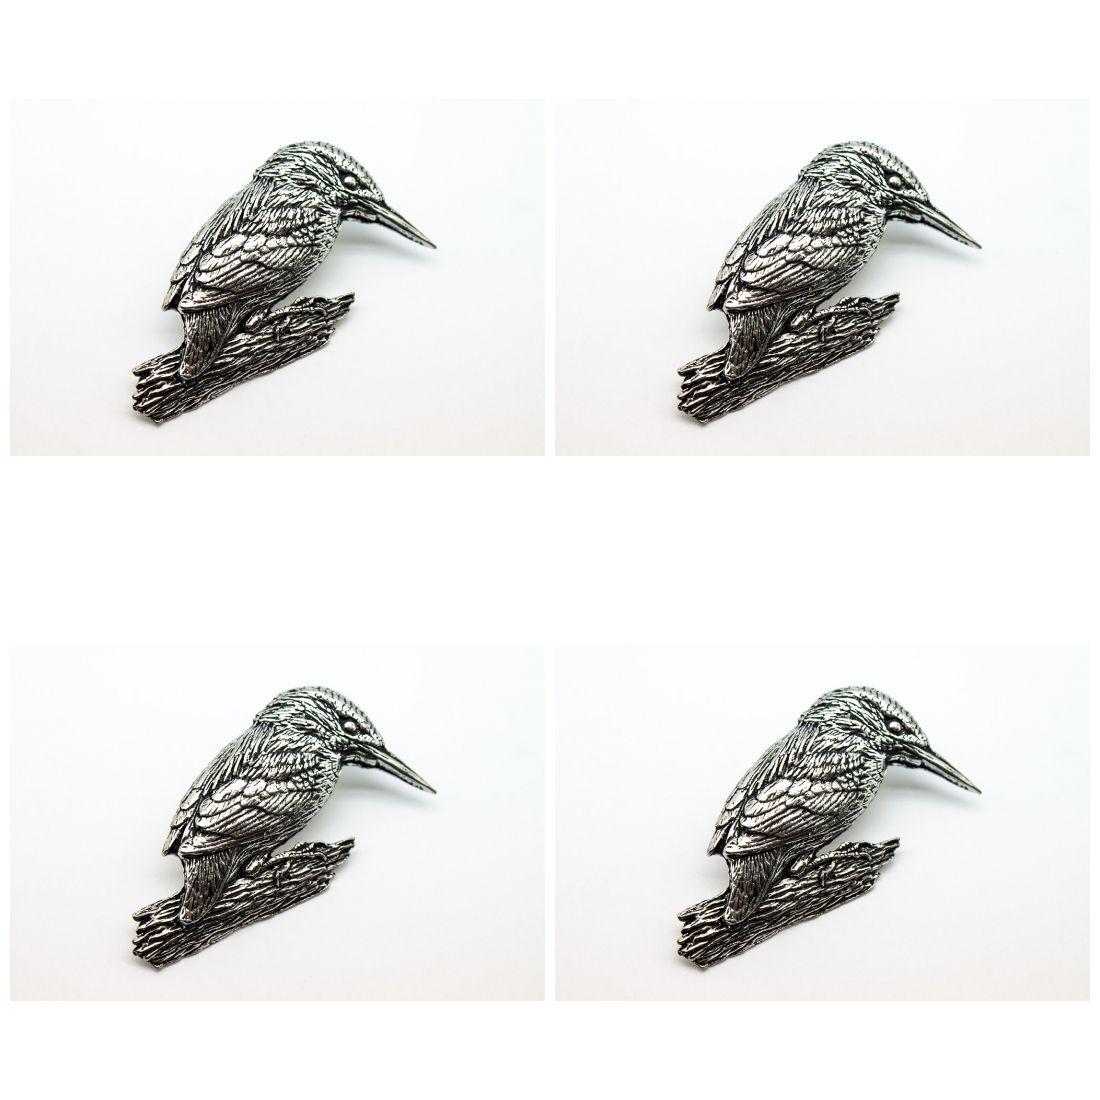 4 x Pin Anstecker Badge Eisvogel, 4,5x2,7cm